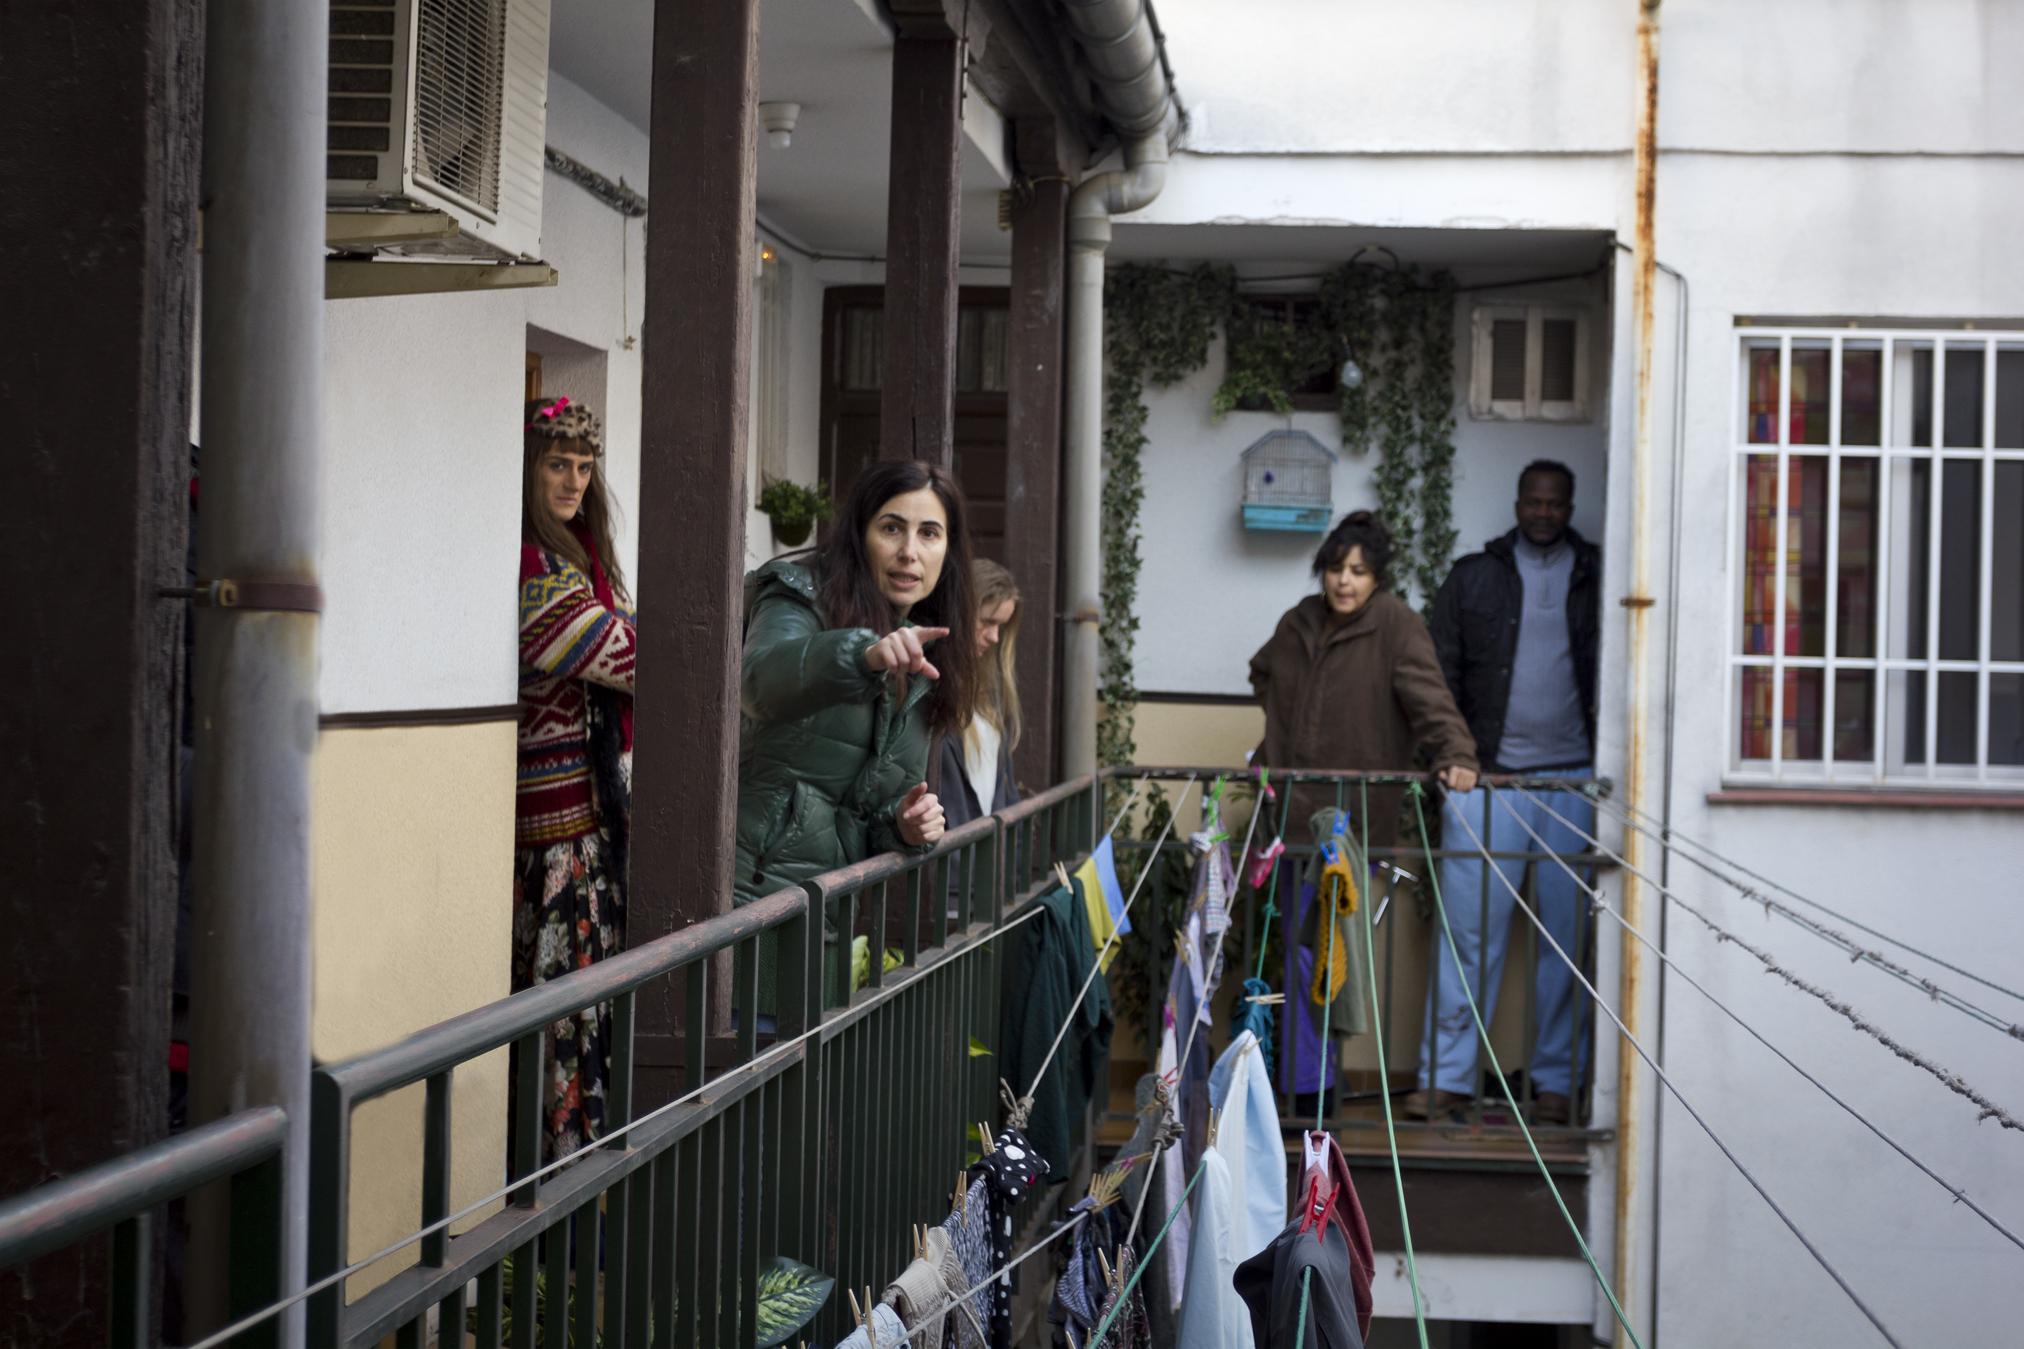 Marina Seresesky and Asier Etxeandia in La puerta abierta (2016)